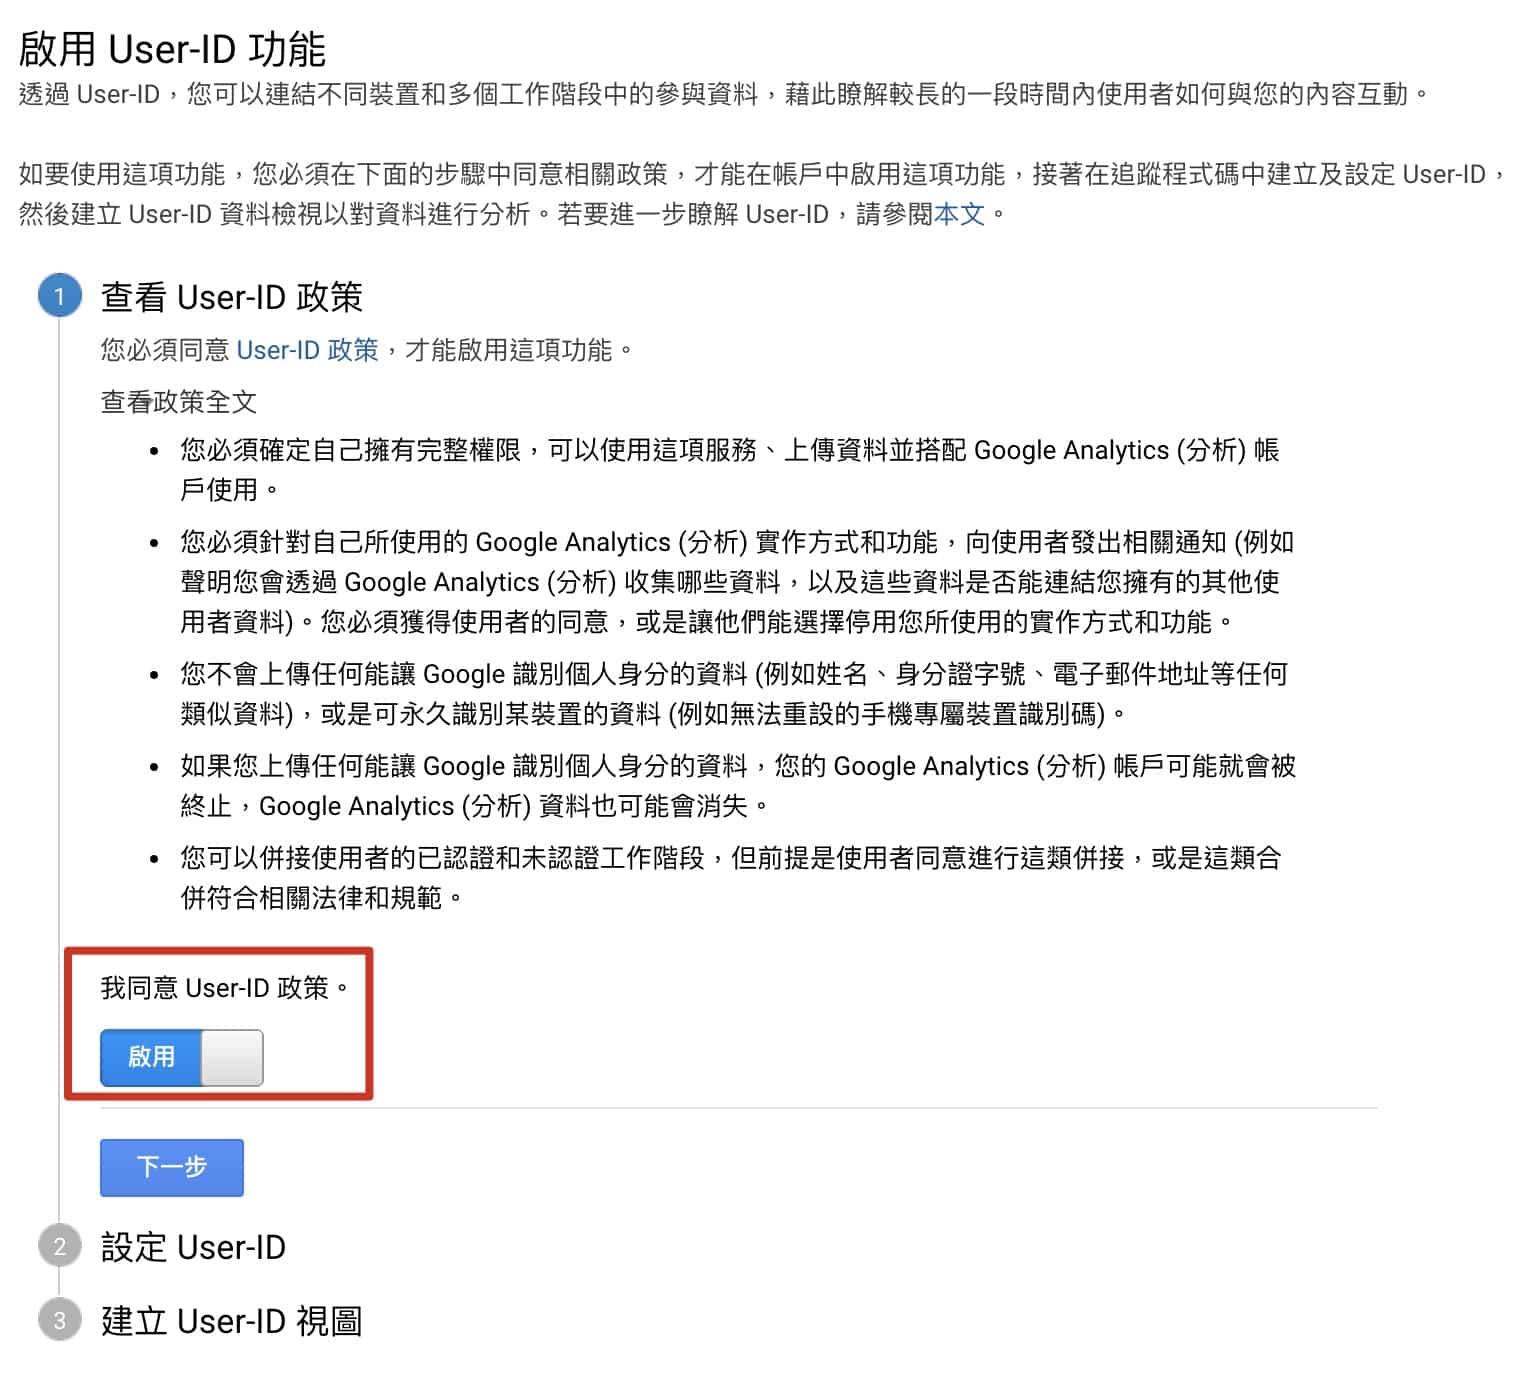 Step 2: 同意 Google 對於 user id 搜集的相關政策。